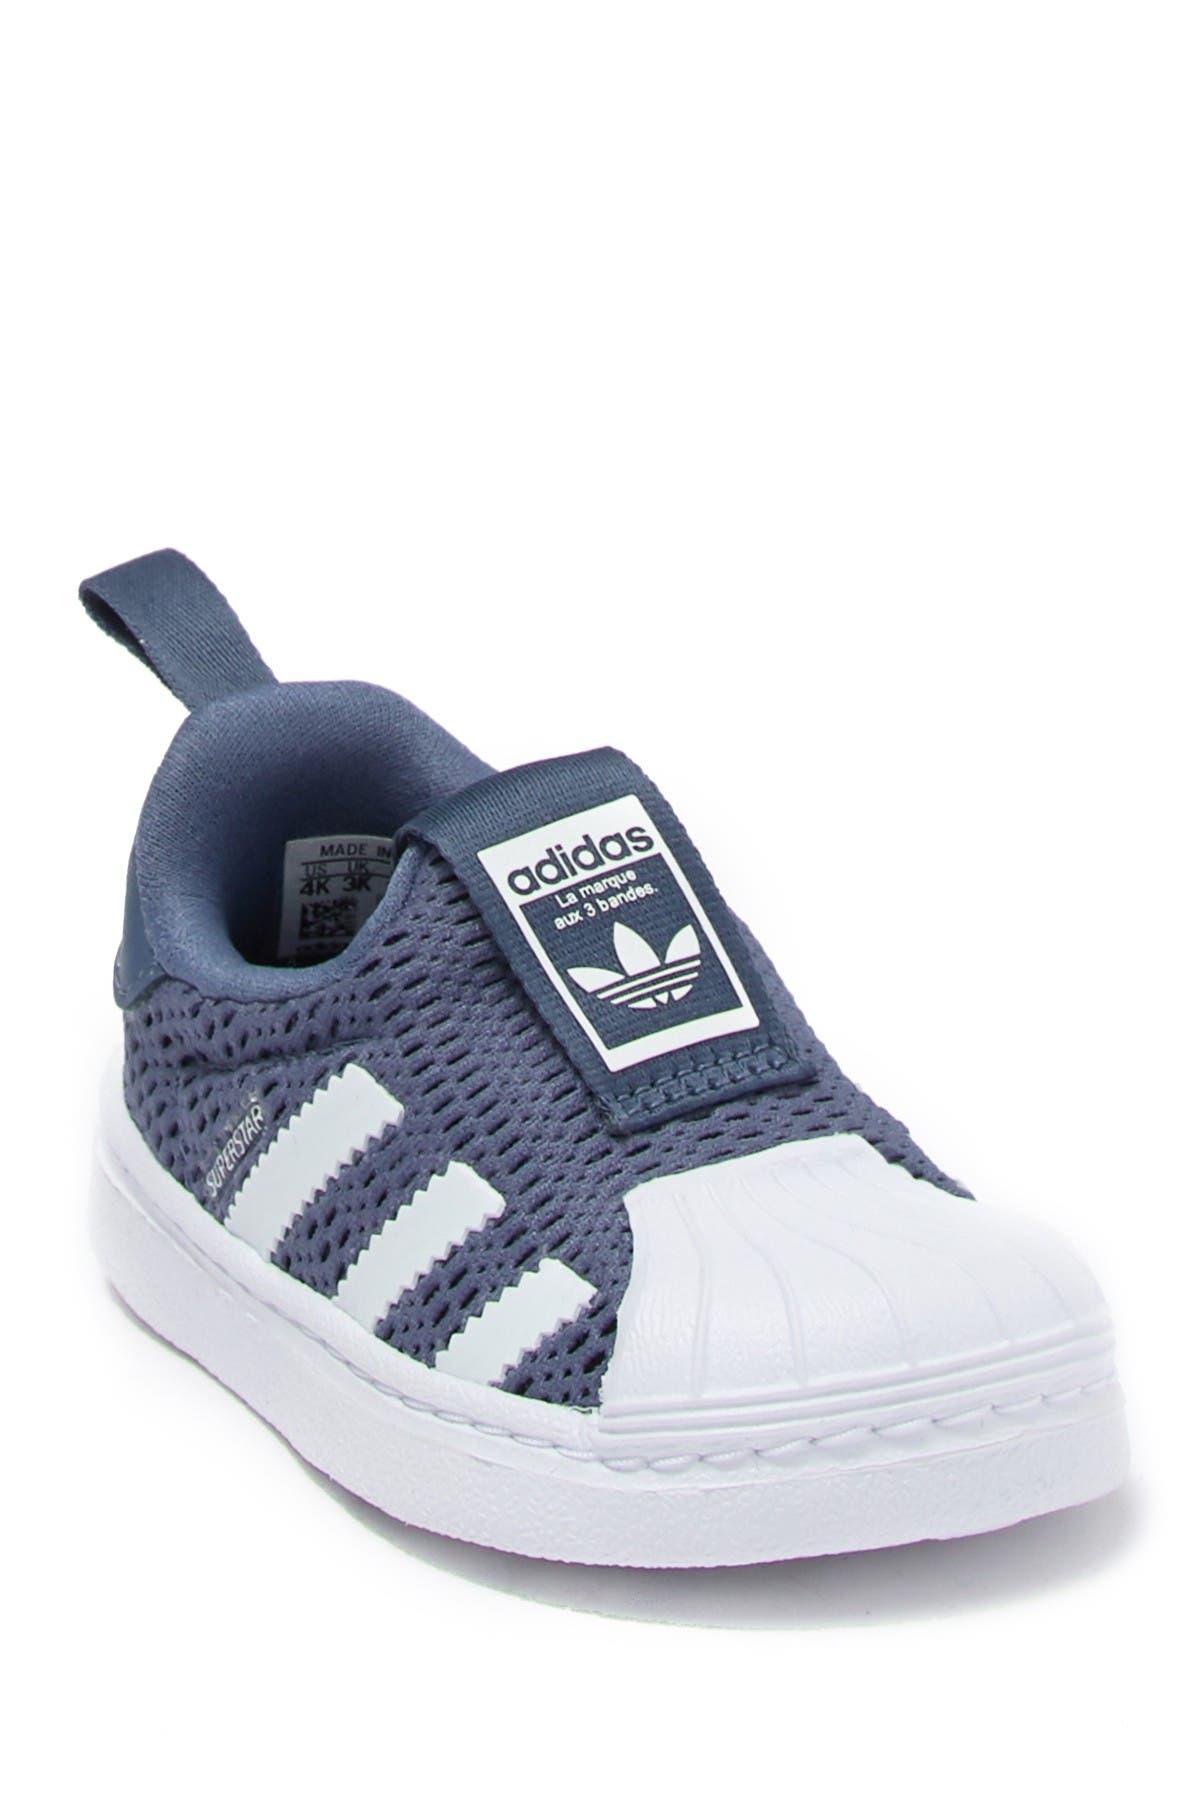 adidas | Superstar 360 Sneaker